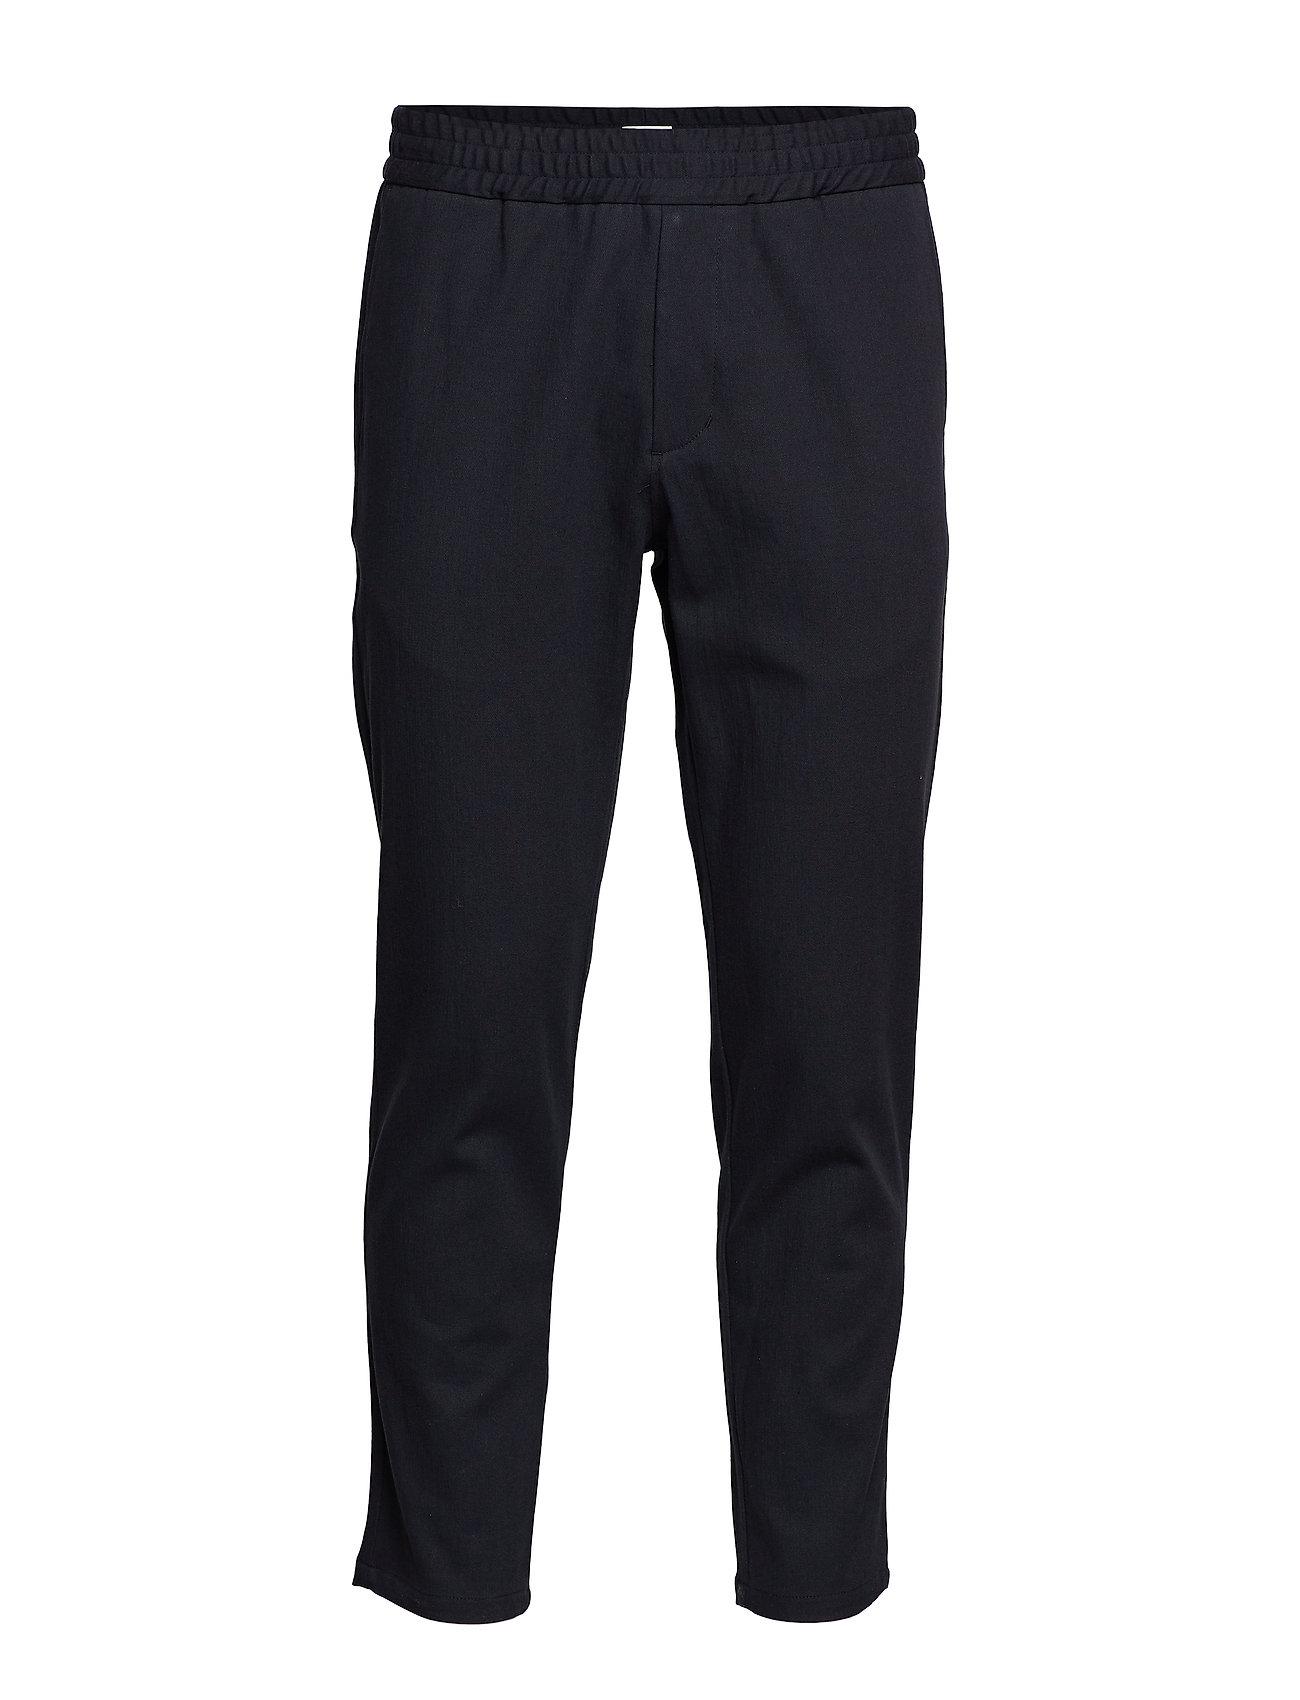 Filippa K M. Terry Cotton Trouser - DK. NAVY